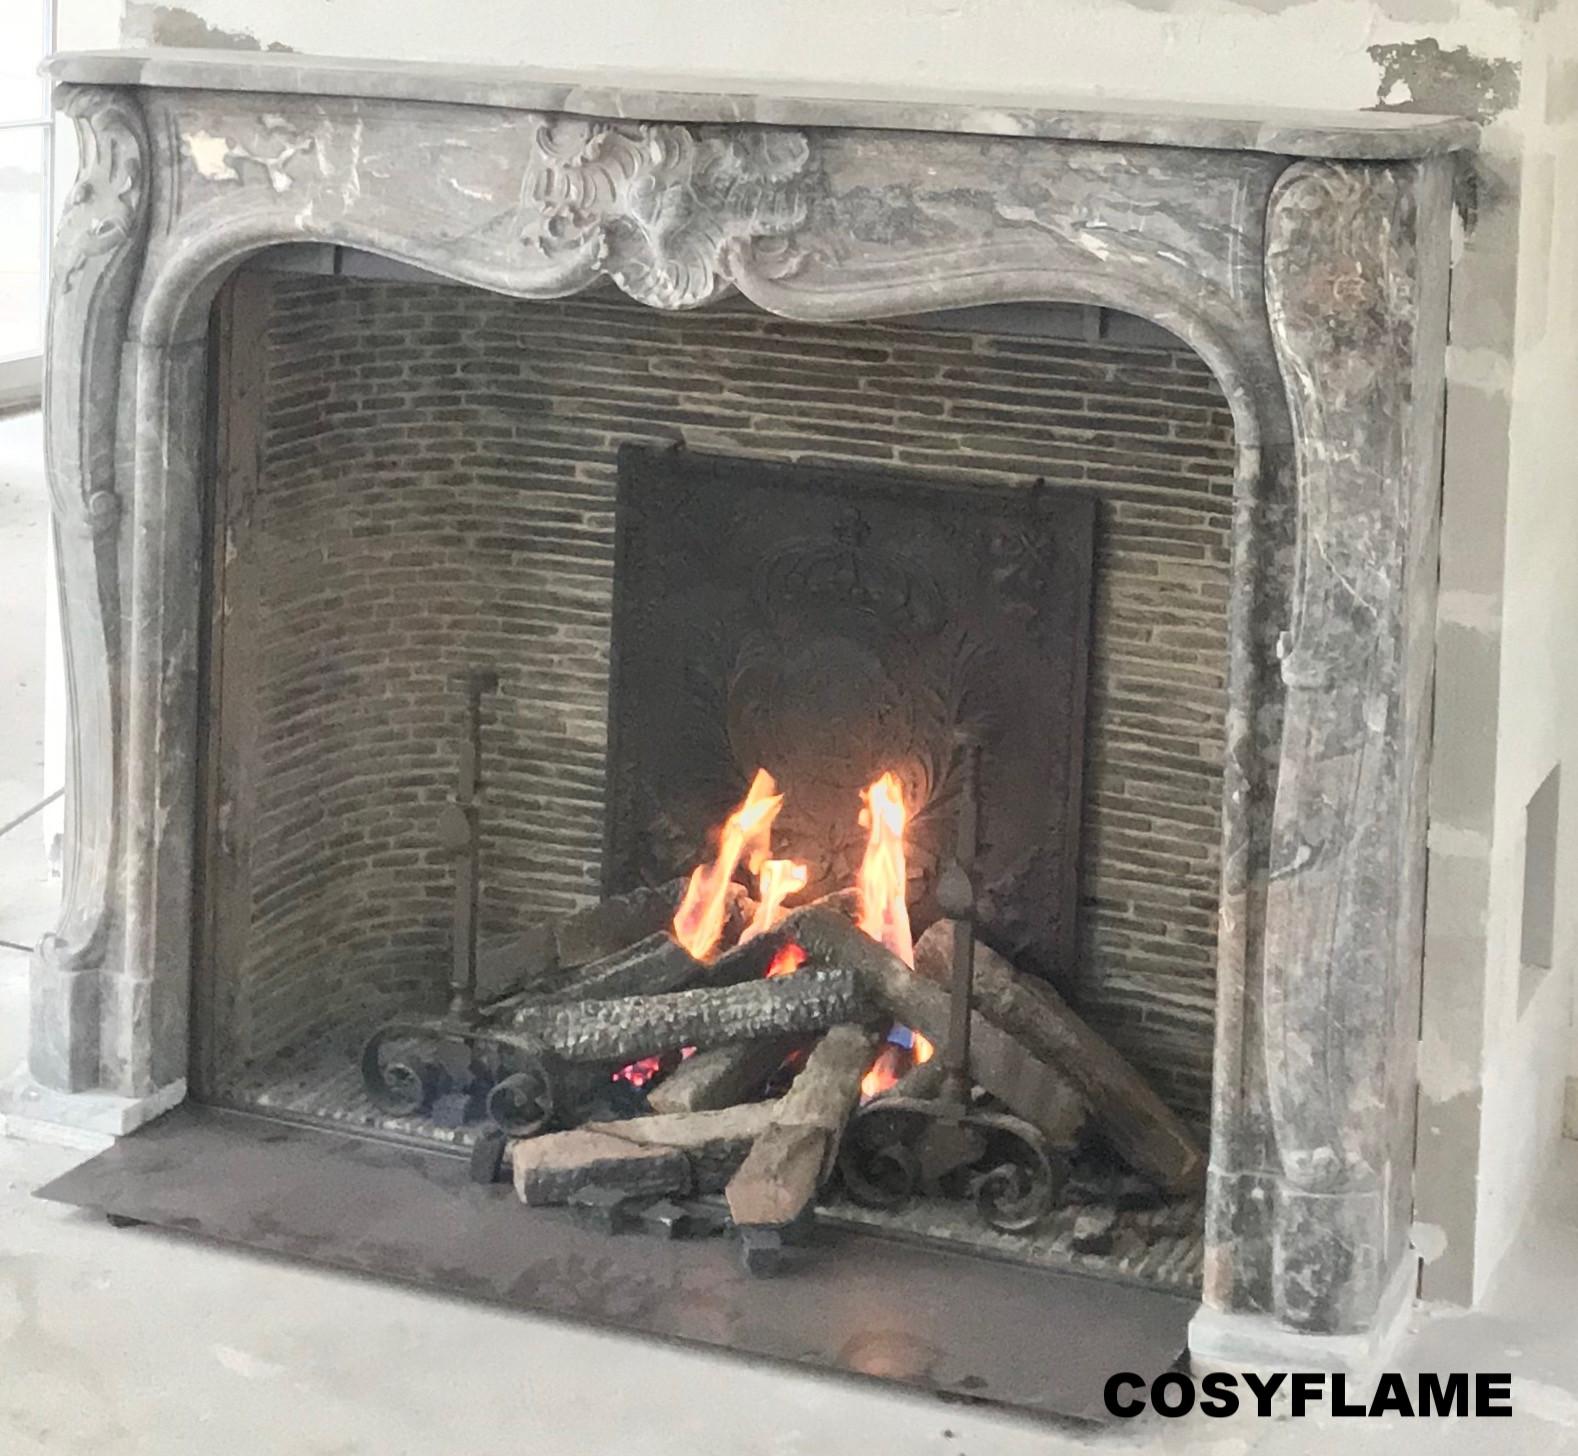 Cosyflame-Haardplaat-file3-2